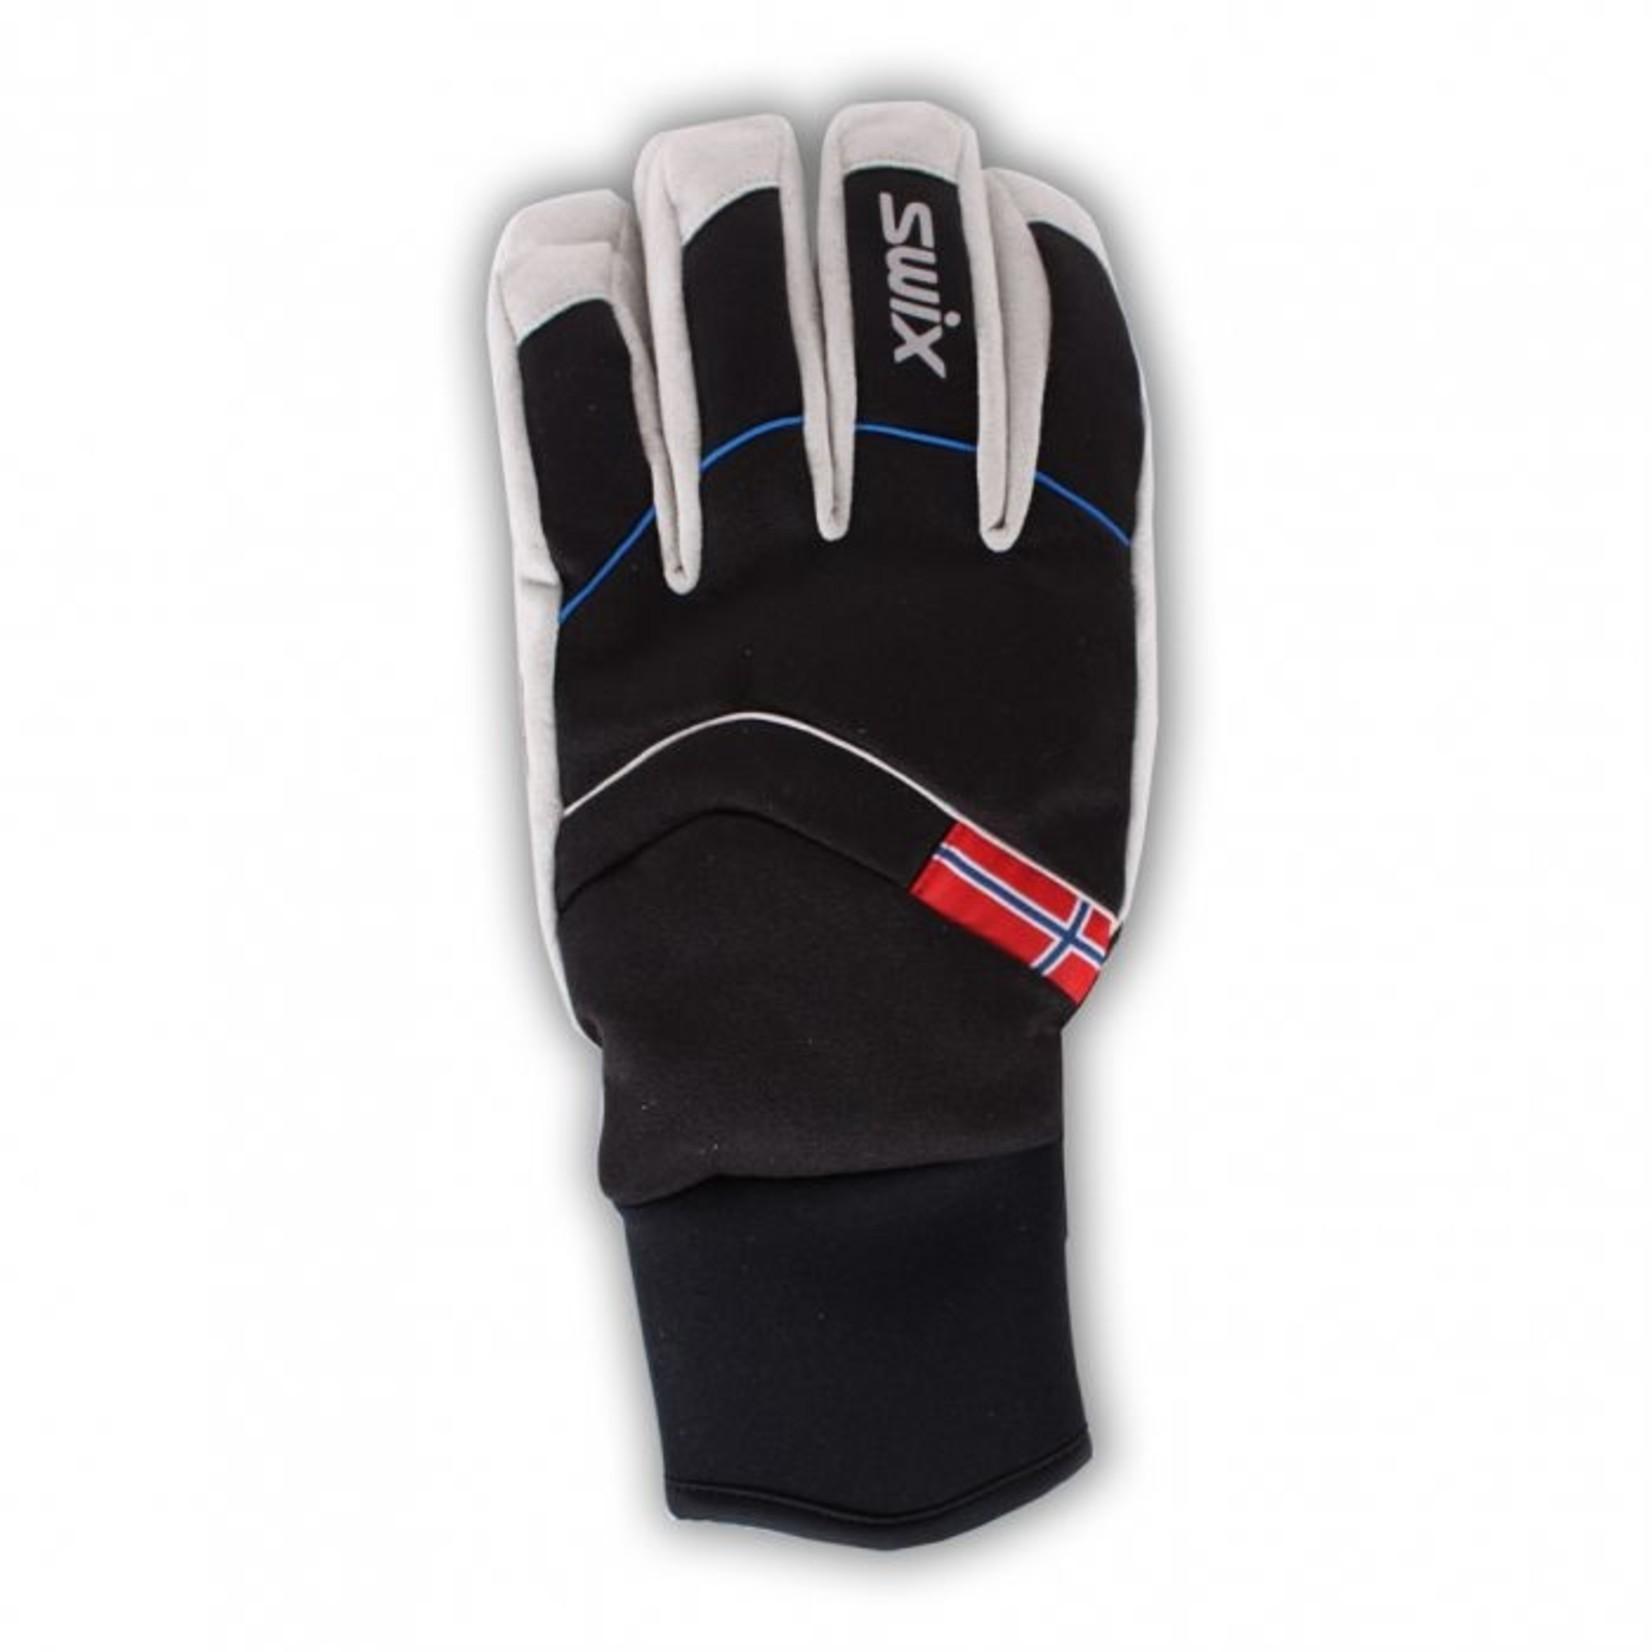 Swix Swix Shield Glove, Men's